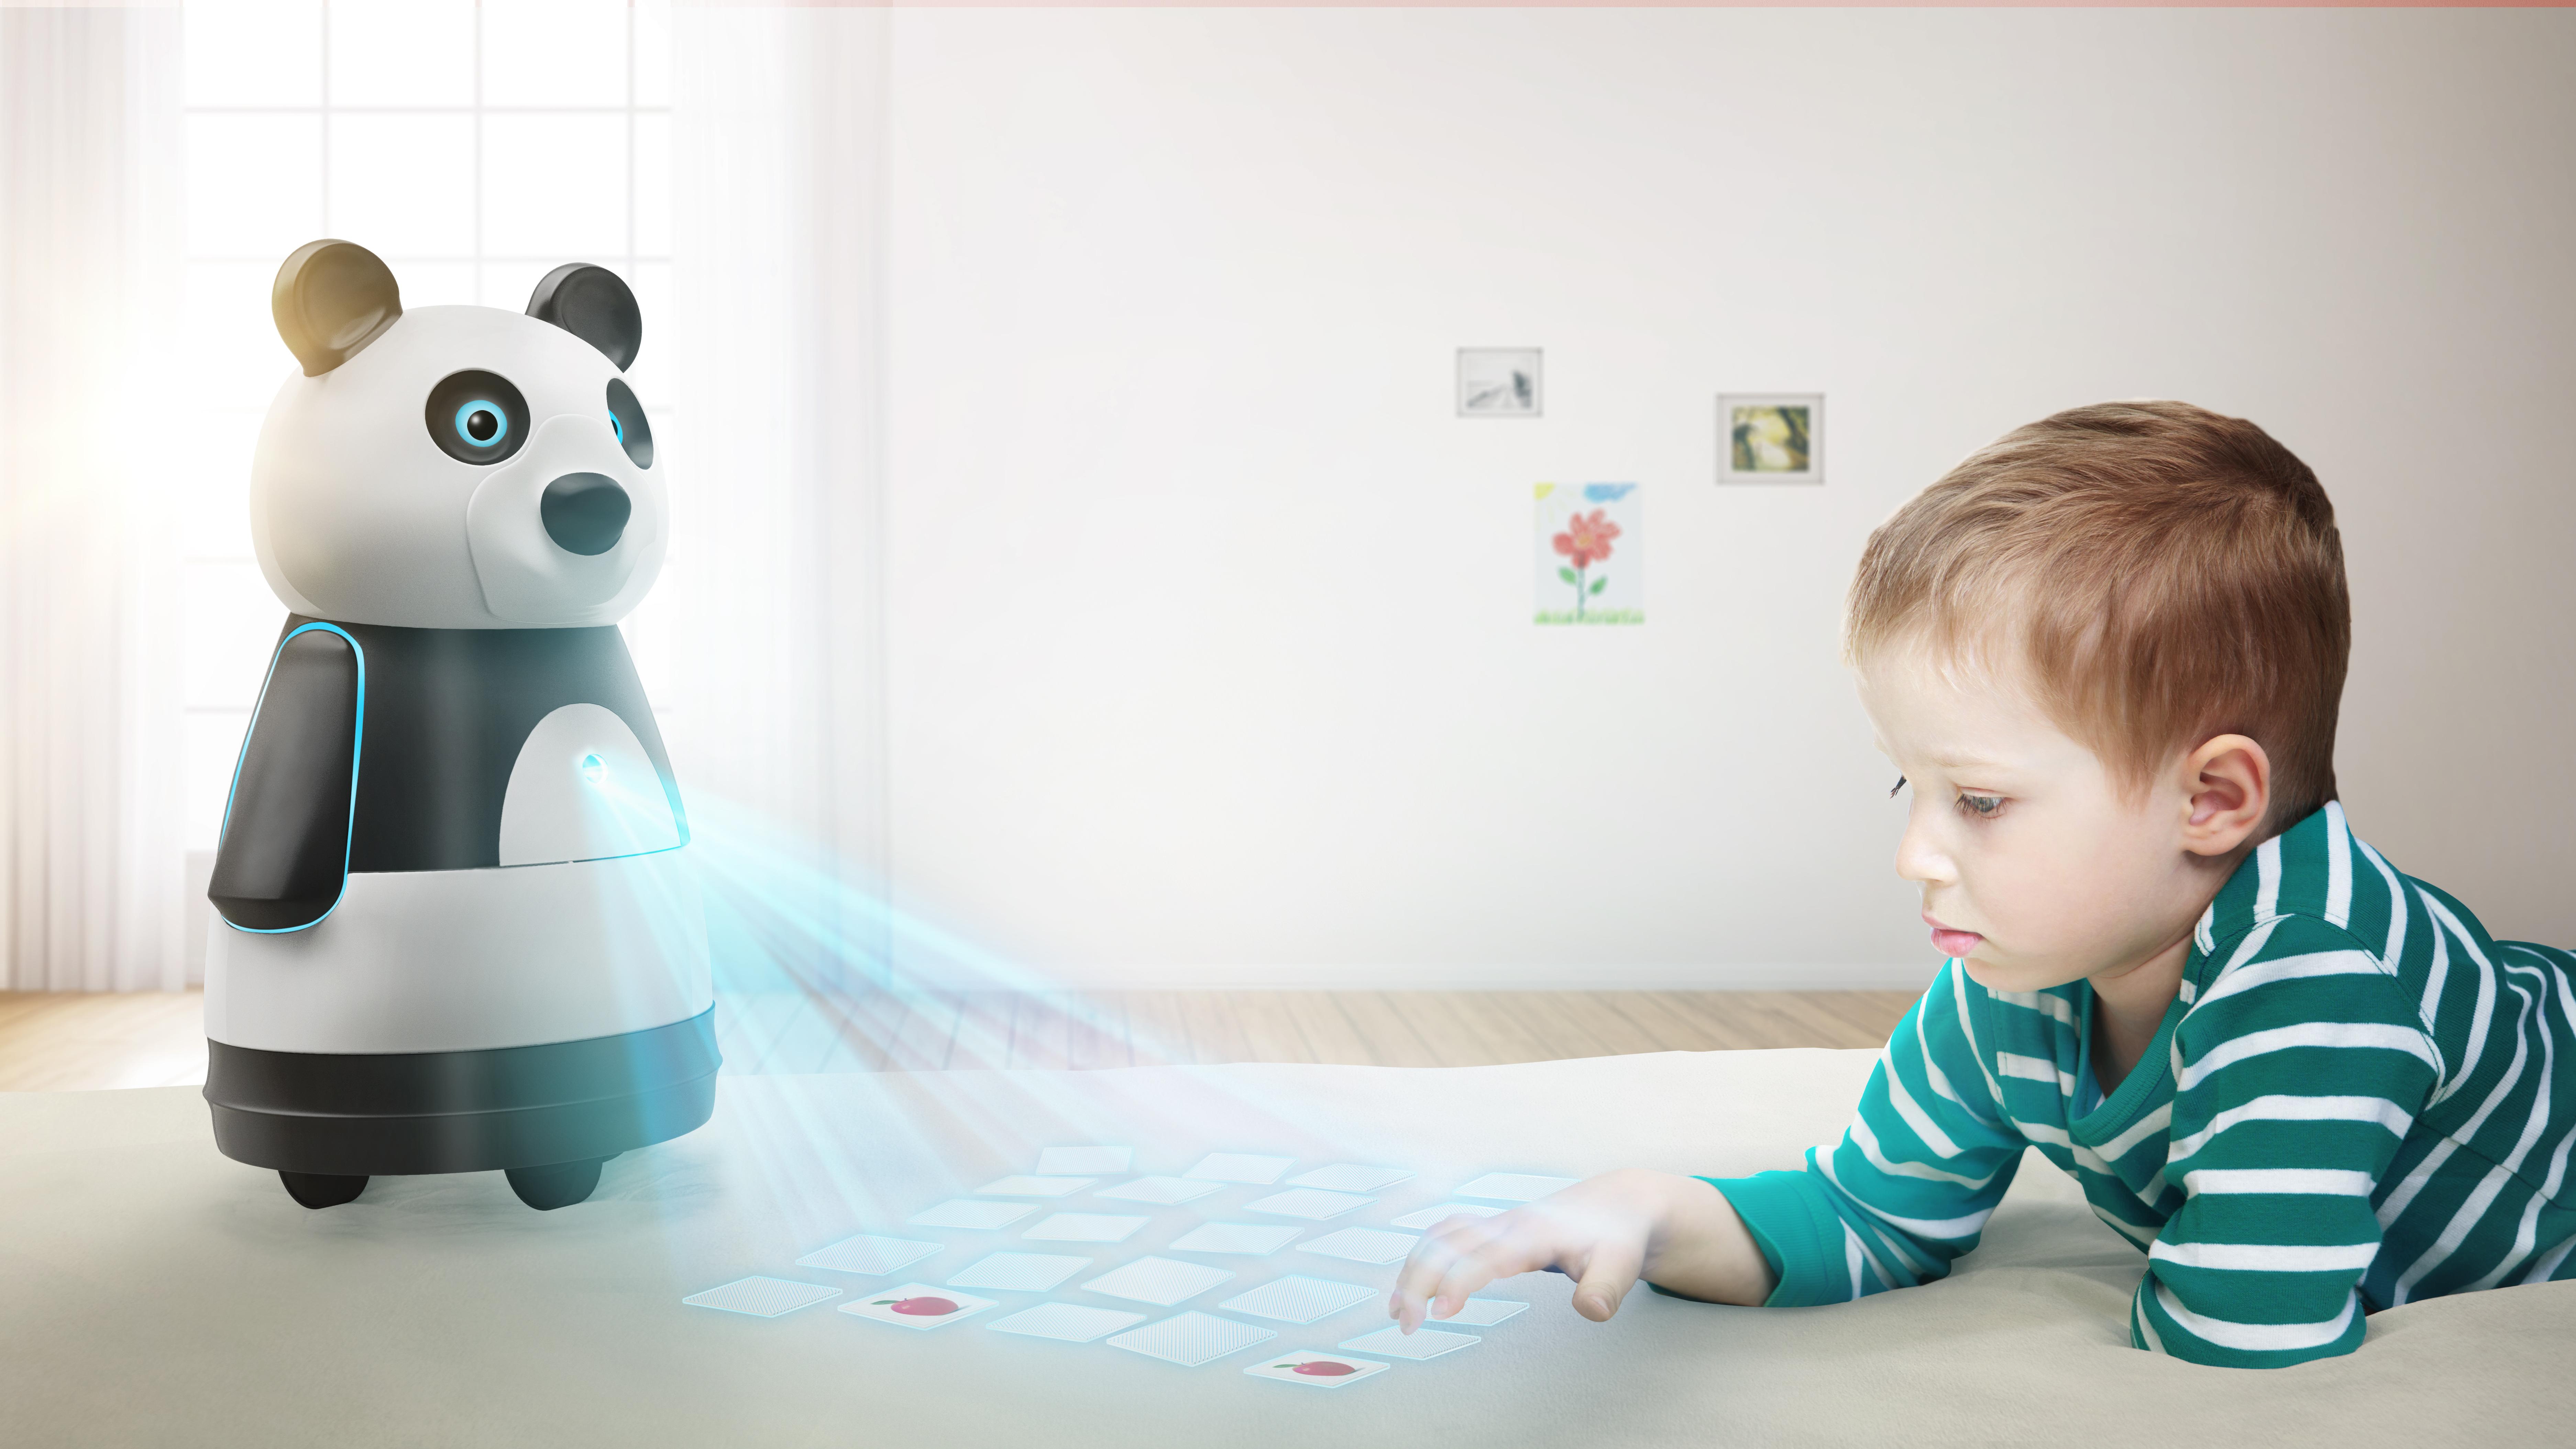 Interaktive Laserprojektion